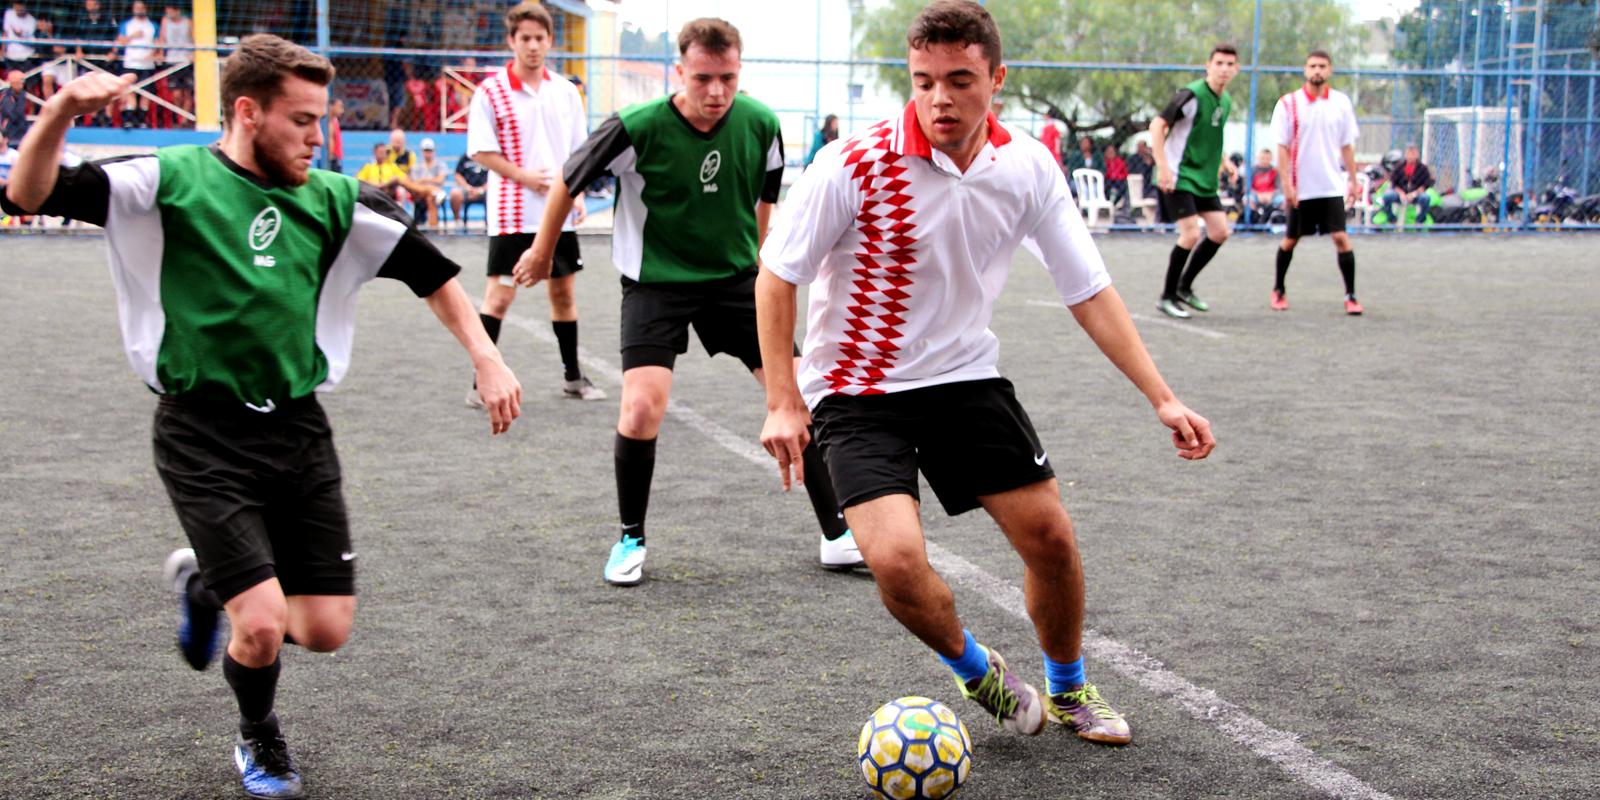 Copa UNIFAAT 2018 começa no sábado